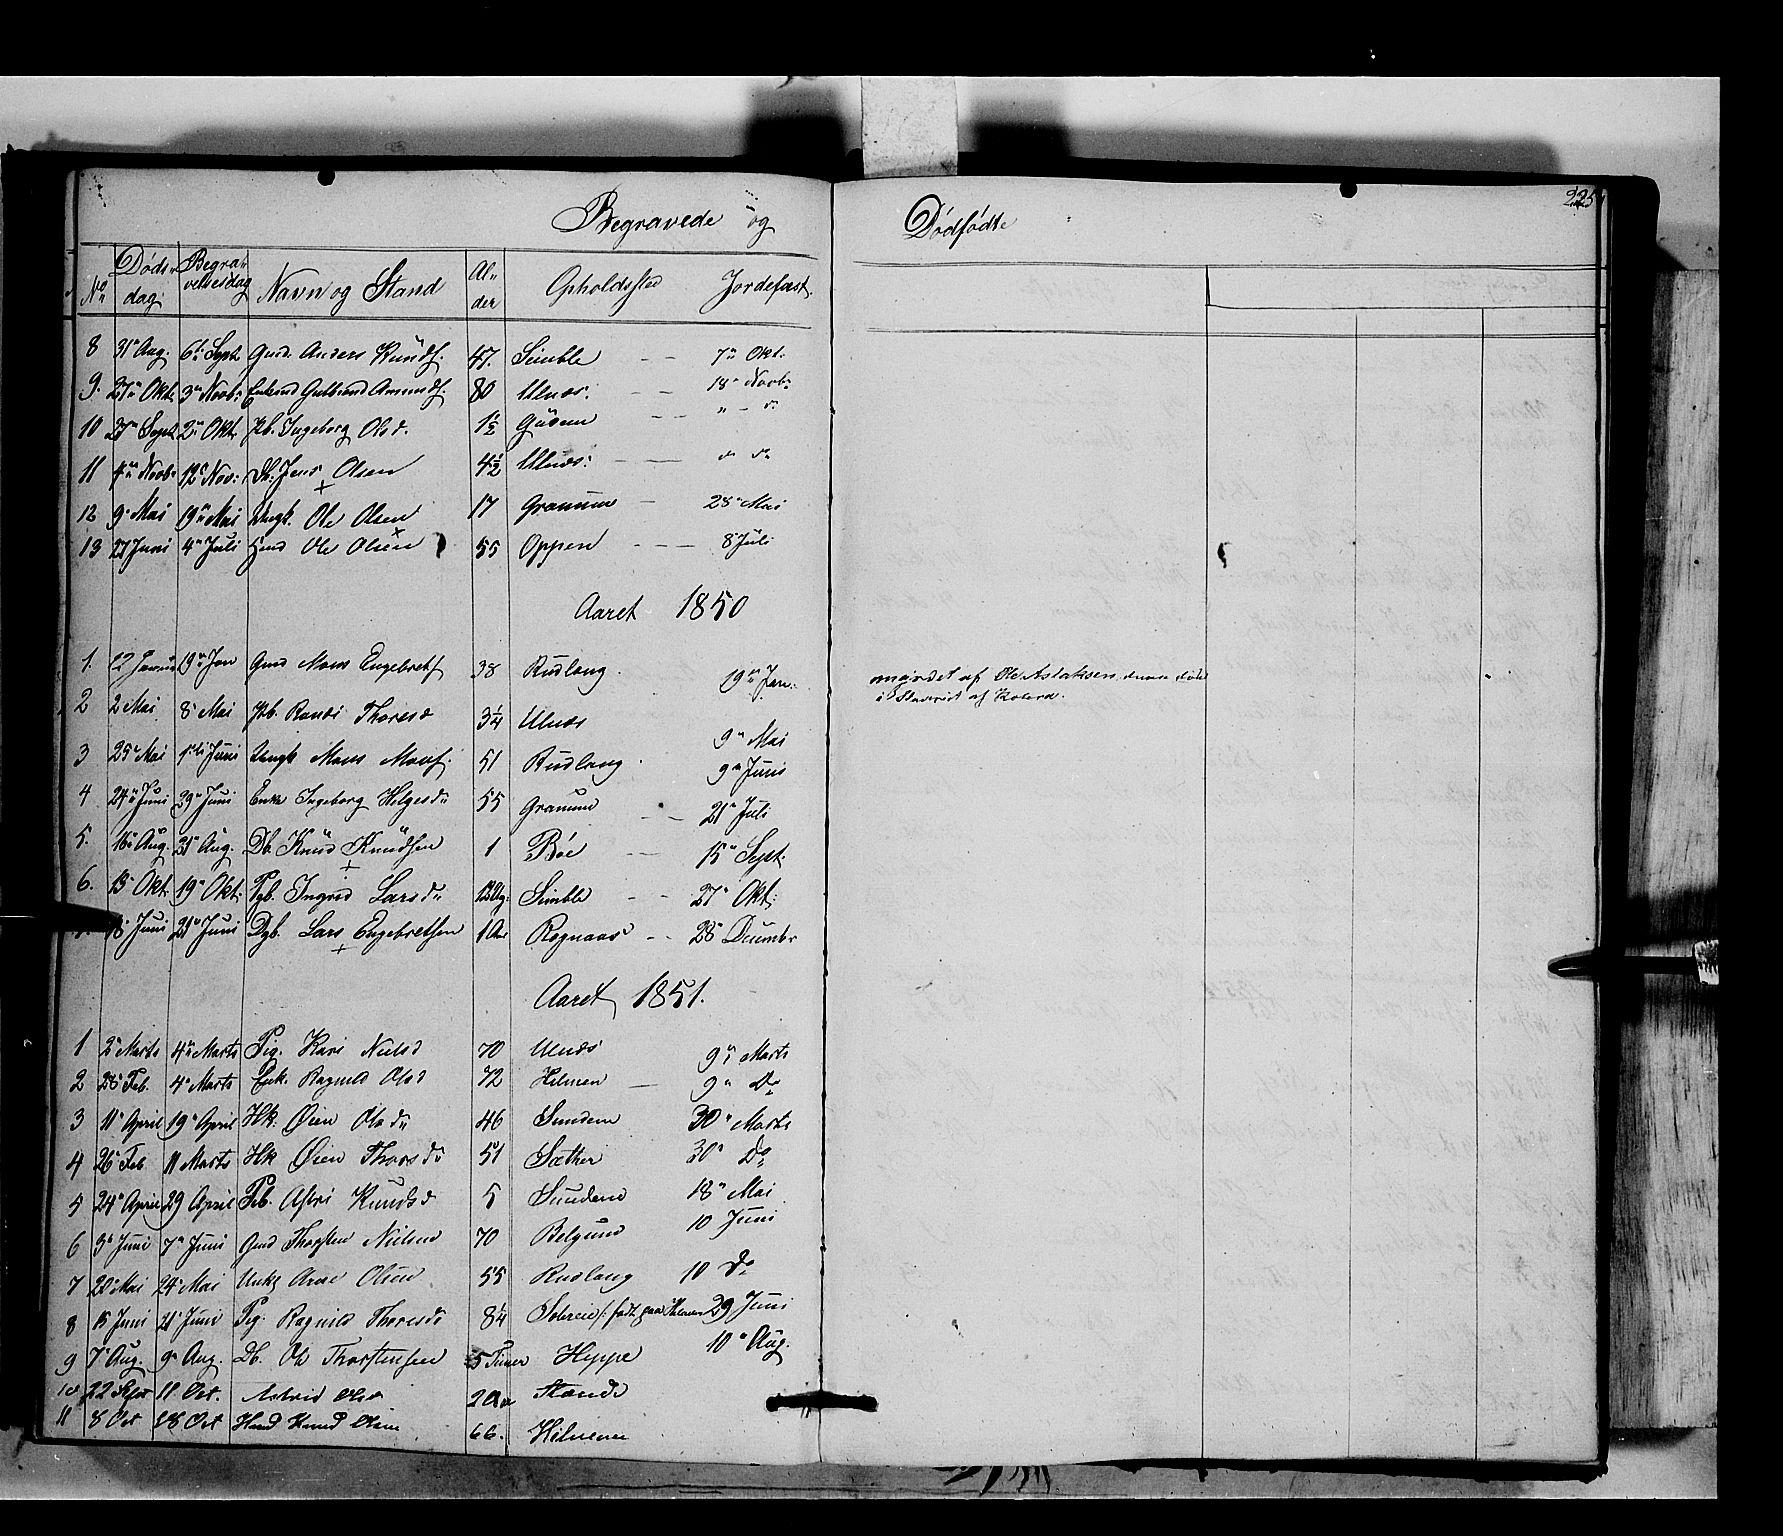 SAH, Nord-Aurdal prestekontor, Ministerialbok nr. 6, 1842-1863, s. 225